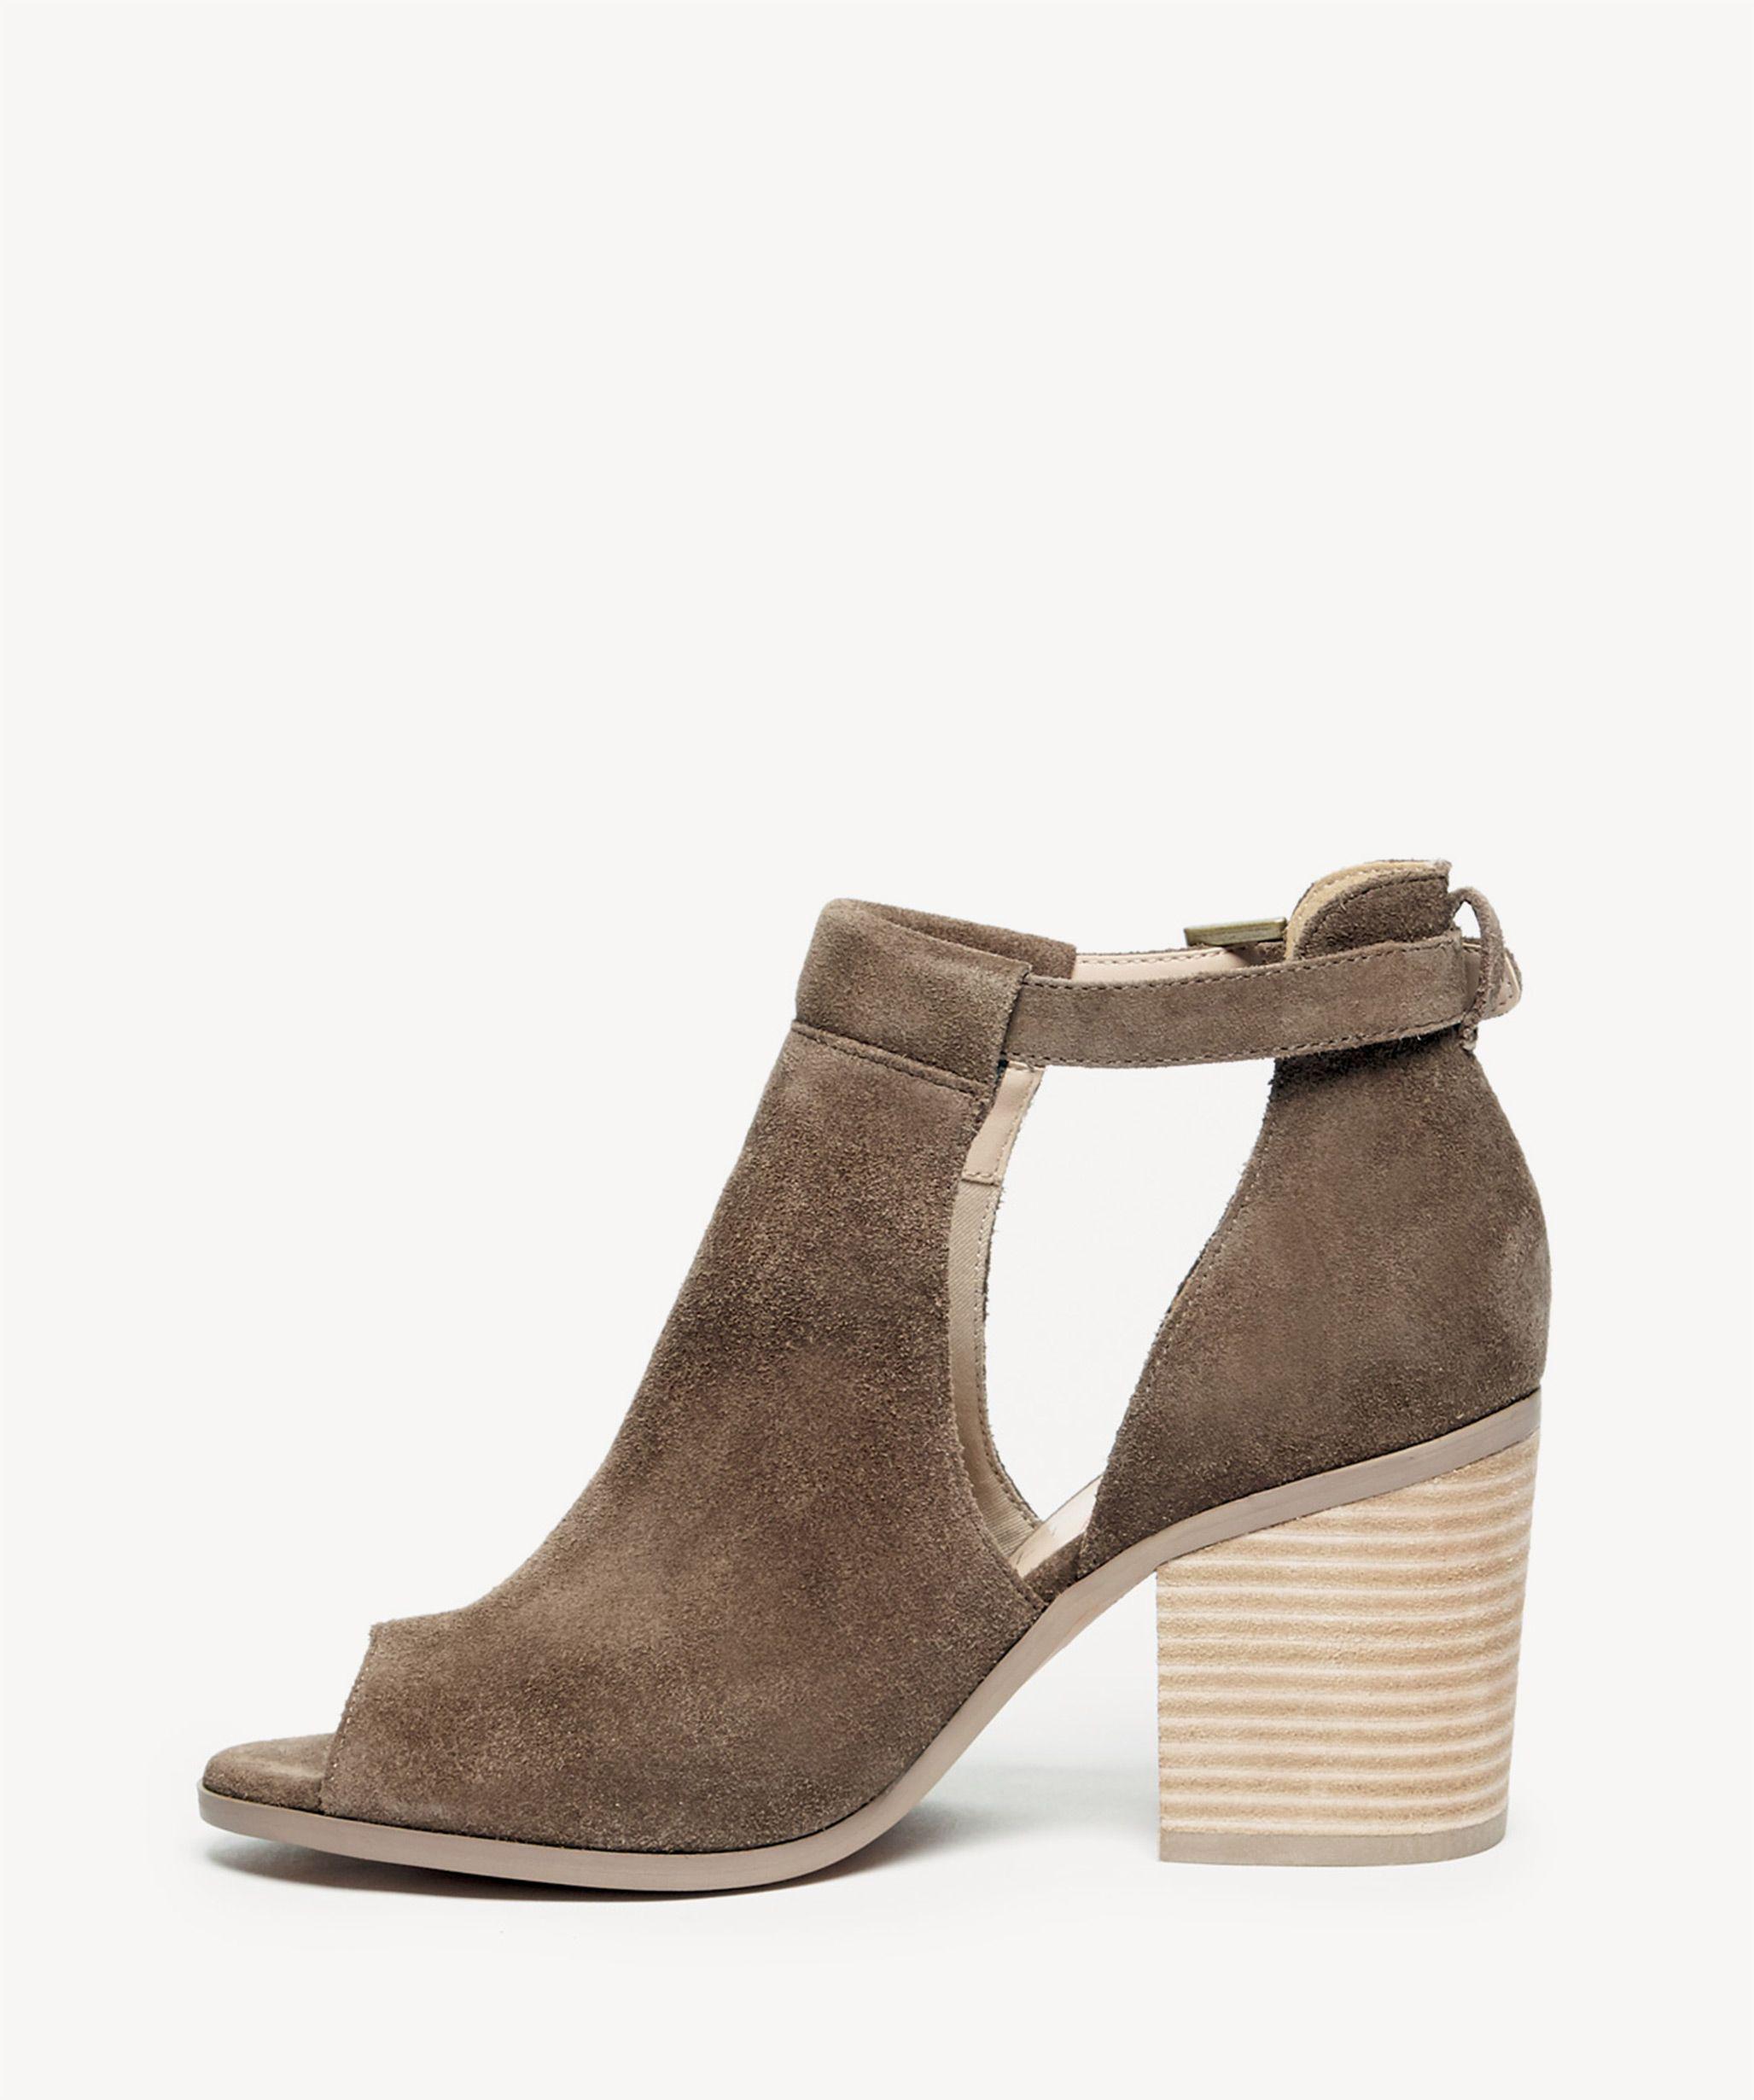 630192ba2186 Lyst - Sole Society Ferris Block Heel Sandal in Brown